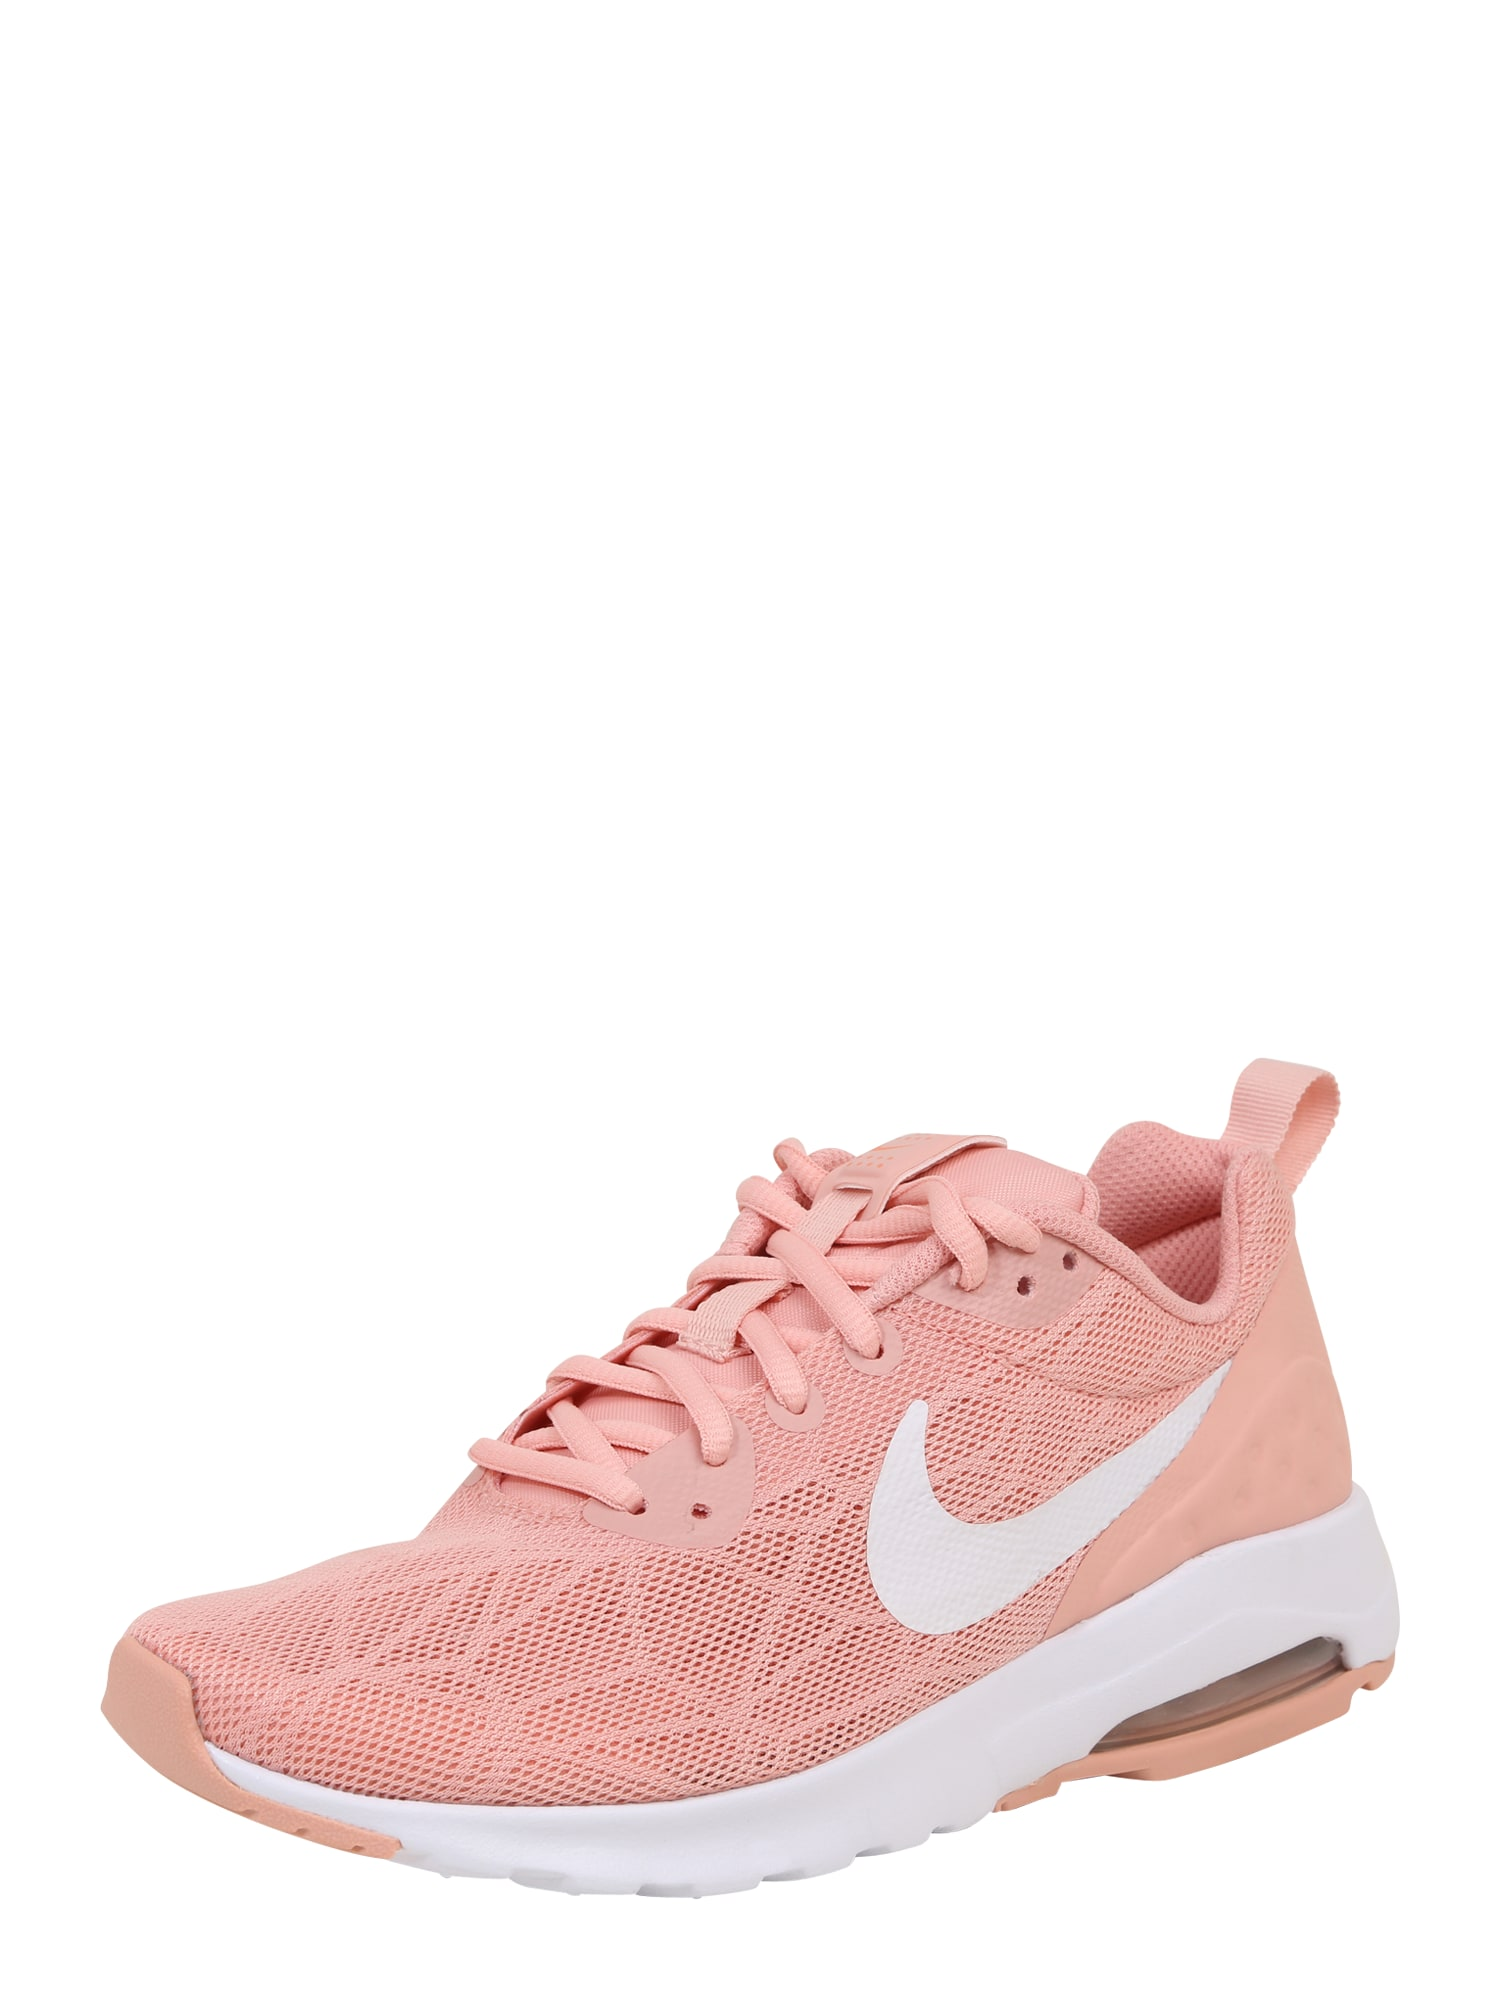 Nike Sportswear, Dames Sneakers laag 'Air Max Motion', abrikoos